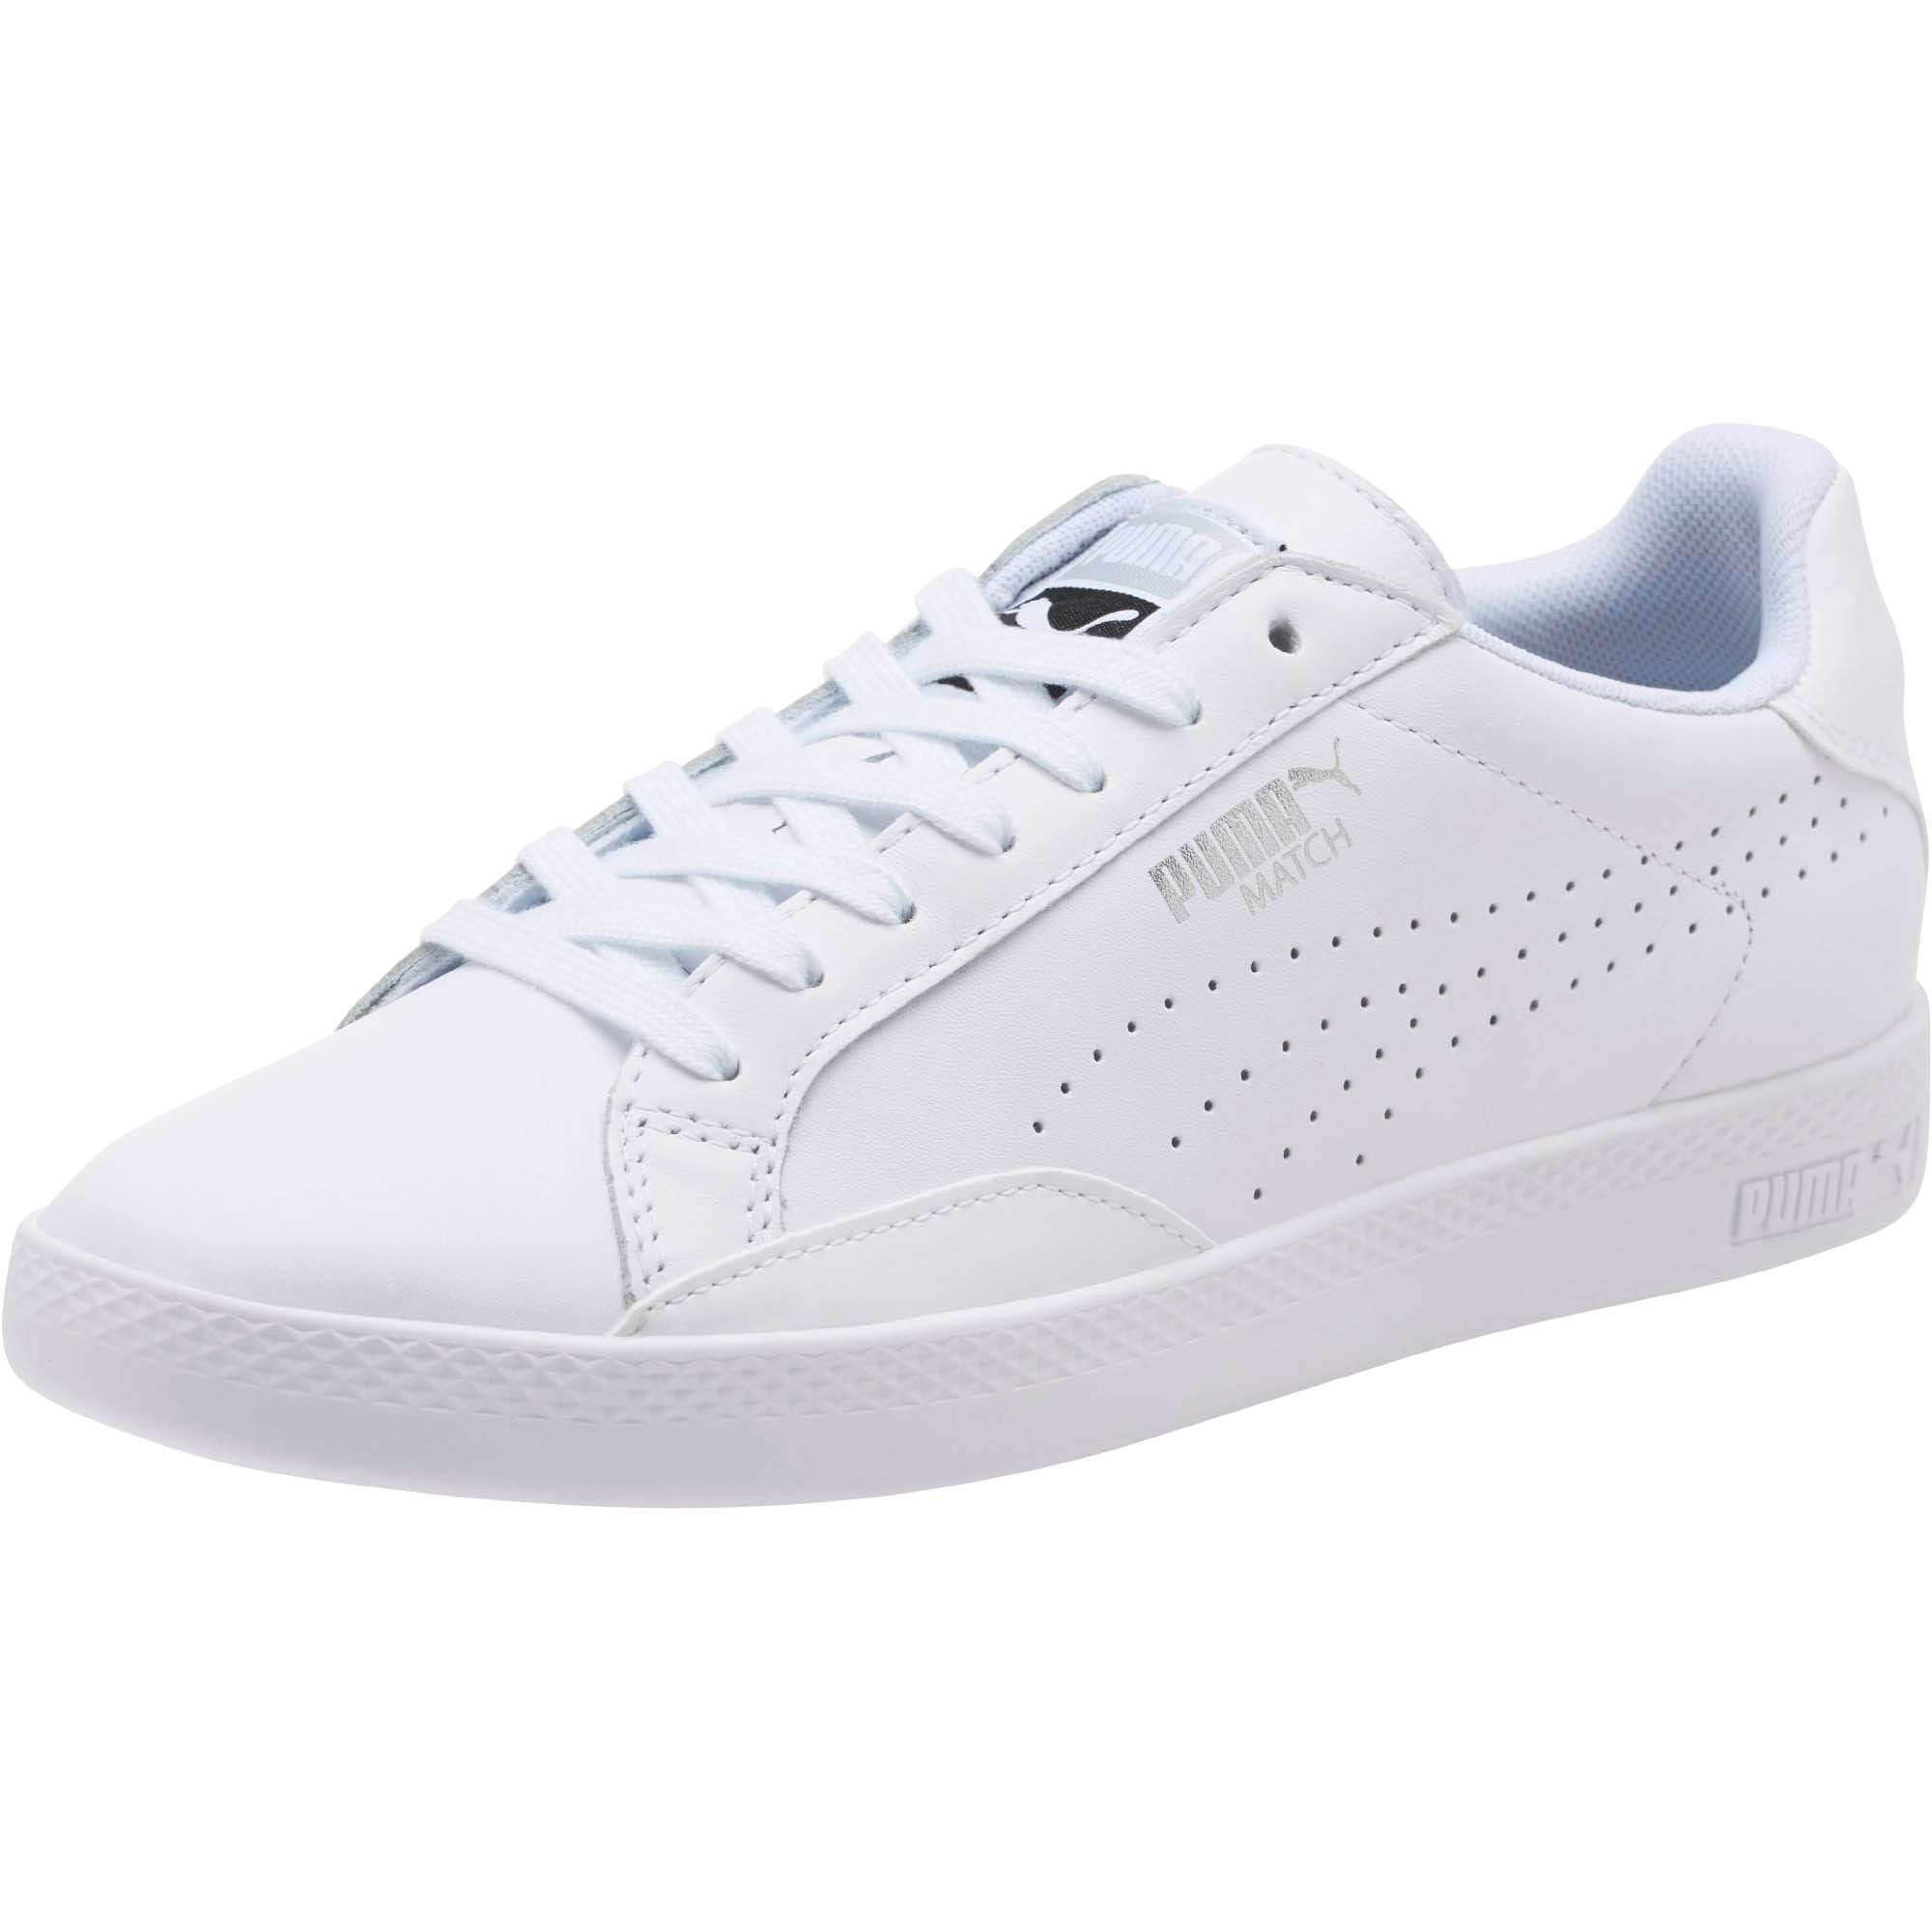 cheap for discount 4c67a 165d9 Match 74 Women's Sneakers